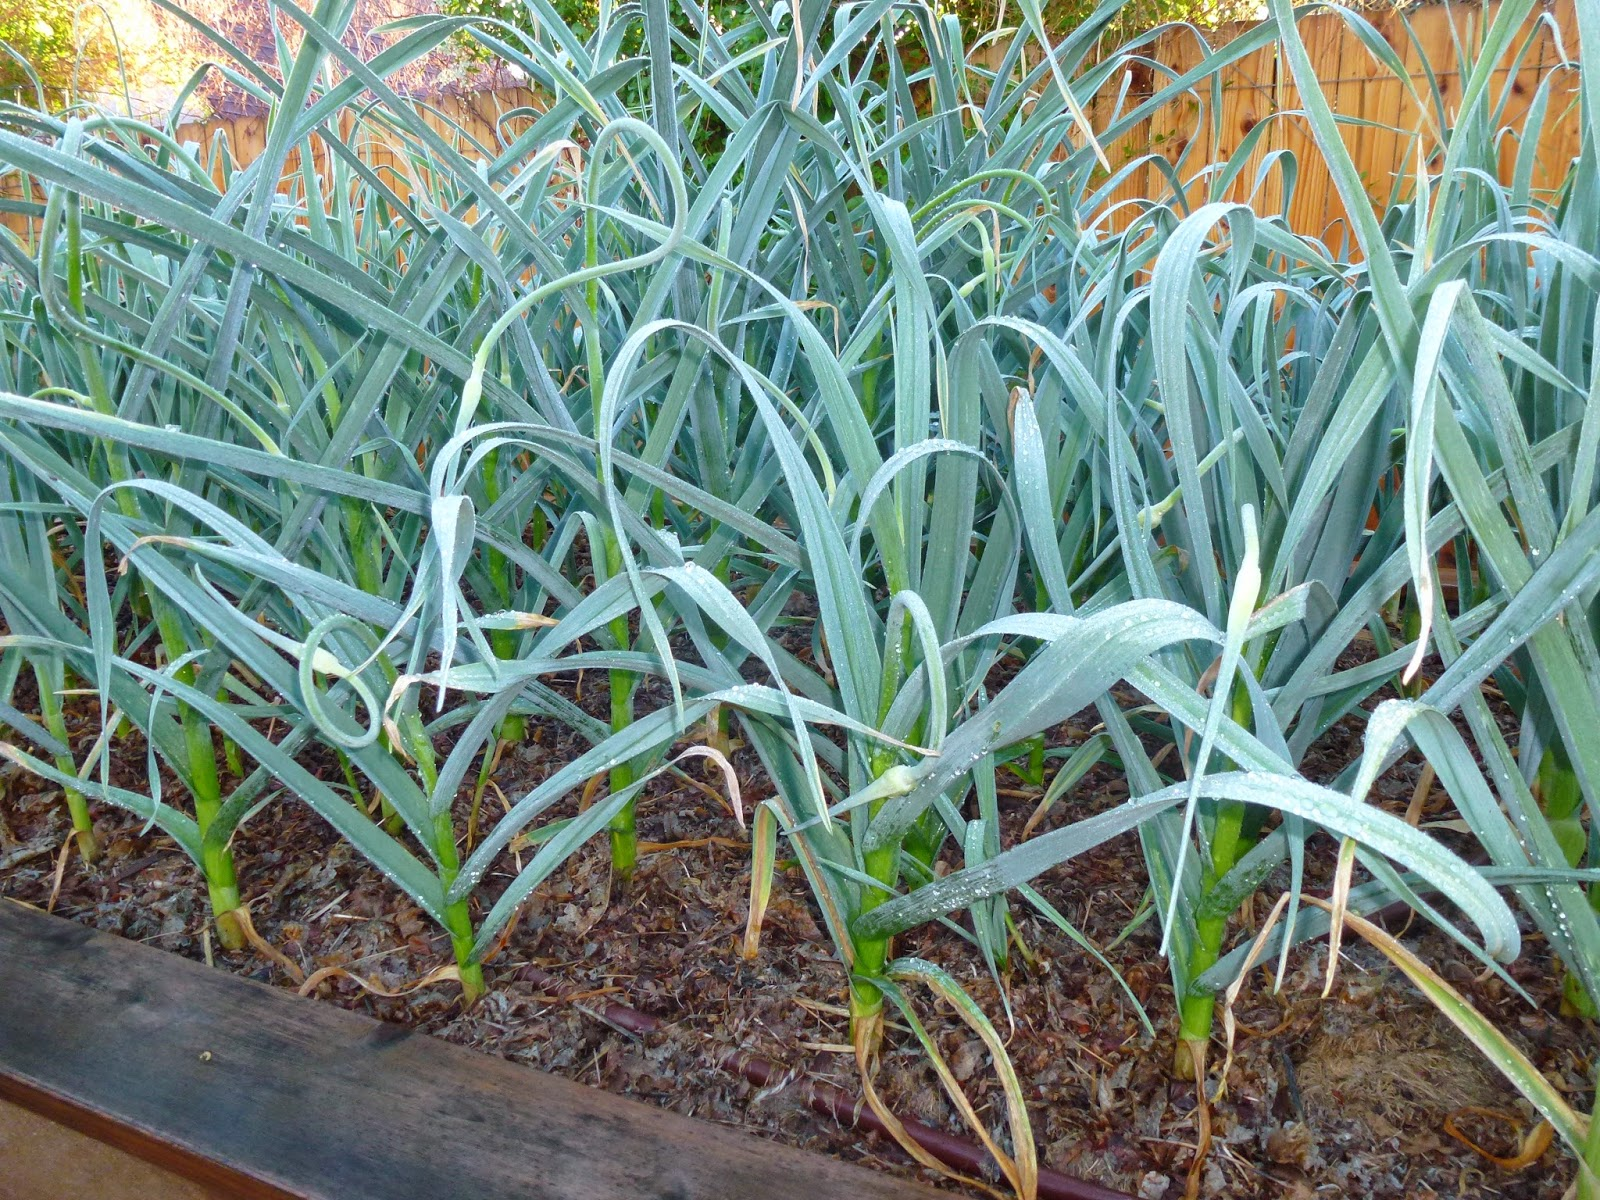 colorado garden punch list garlic growing is grand. Black Bedroom Furniture Sets. Home Design Ideas